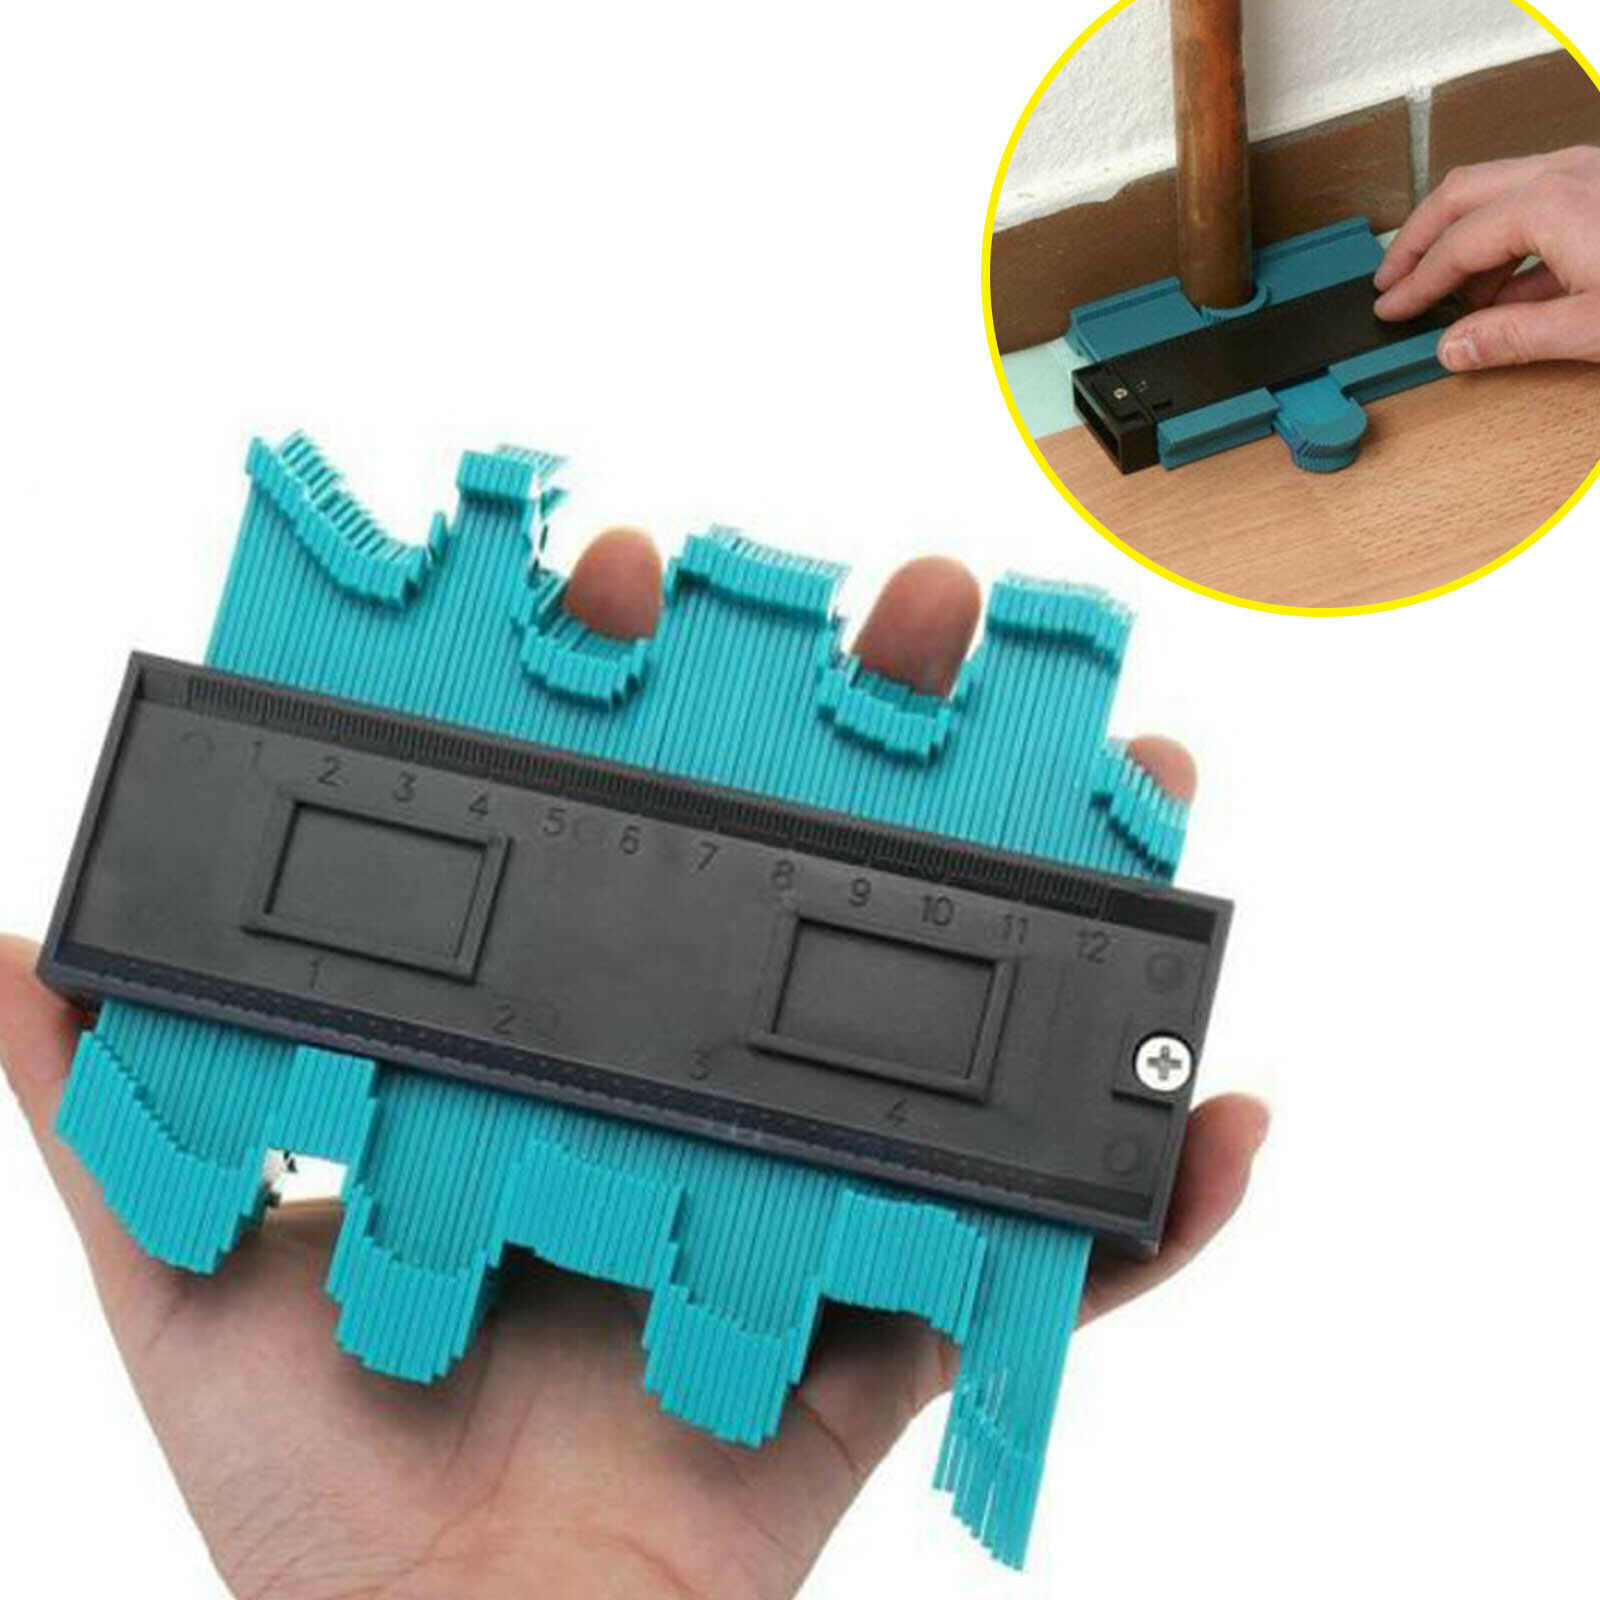 Plastic Gauge Contour Profile Copy Gauge Duplicator 5 Width Wood Marking Tool Set Tiling Laminate Tiles General Tools